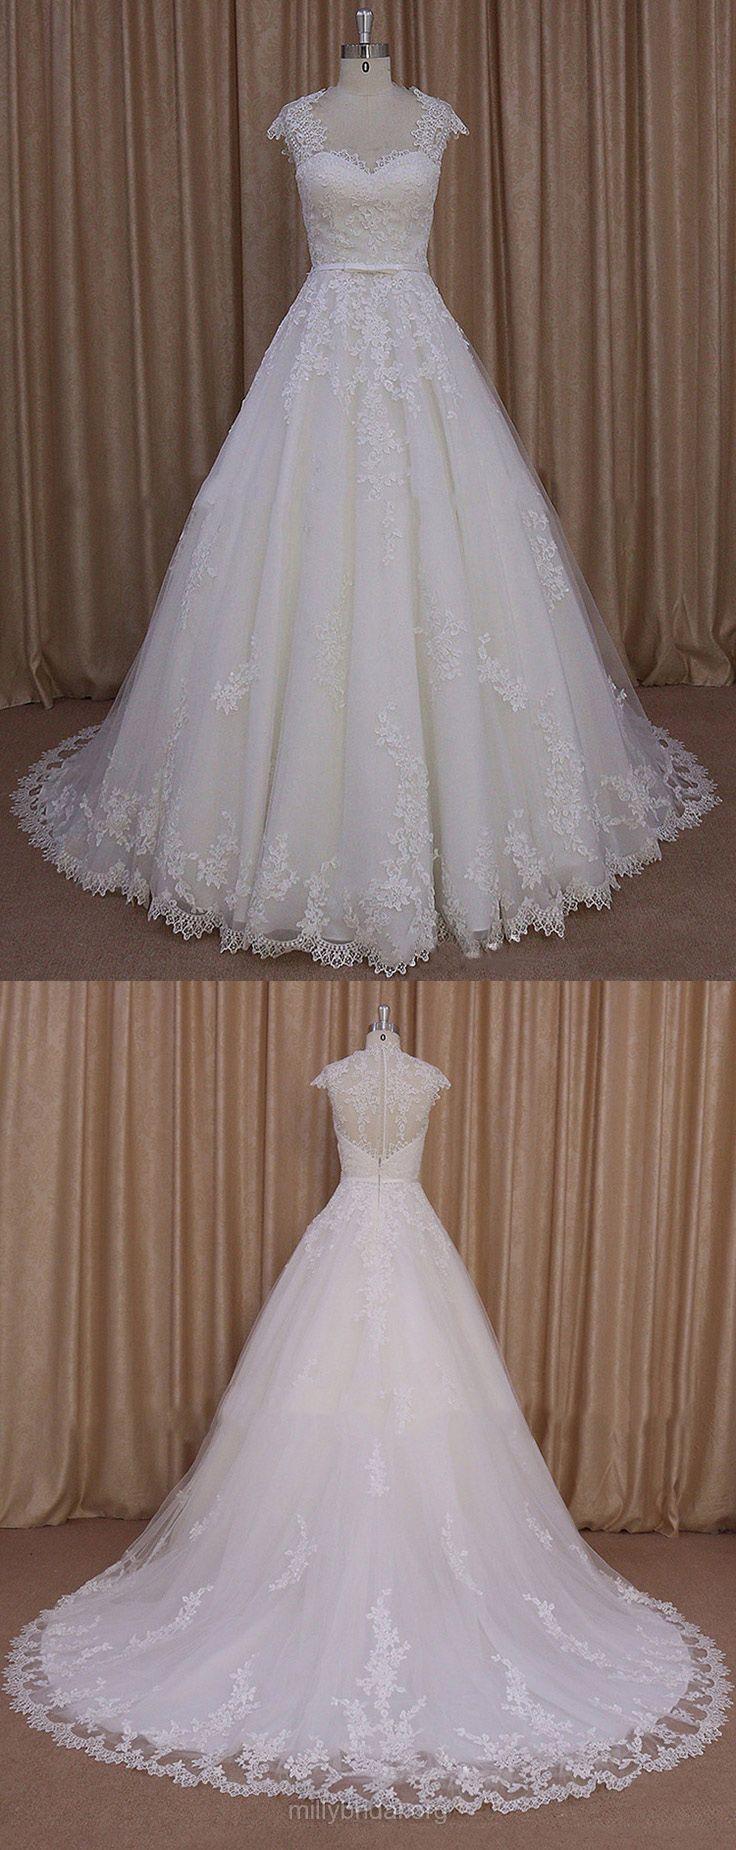 Sweetheart Wedding Dresses Ivory, Tulle Cap Straps Wedding Dress Lace, Court Train Simple Wedding Dresses Modest